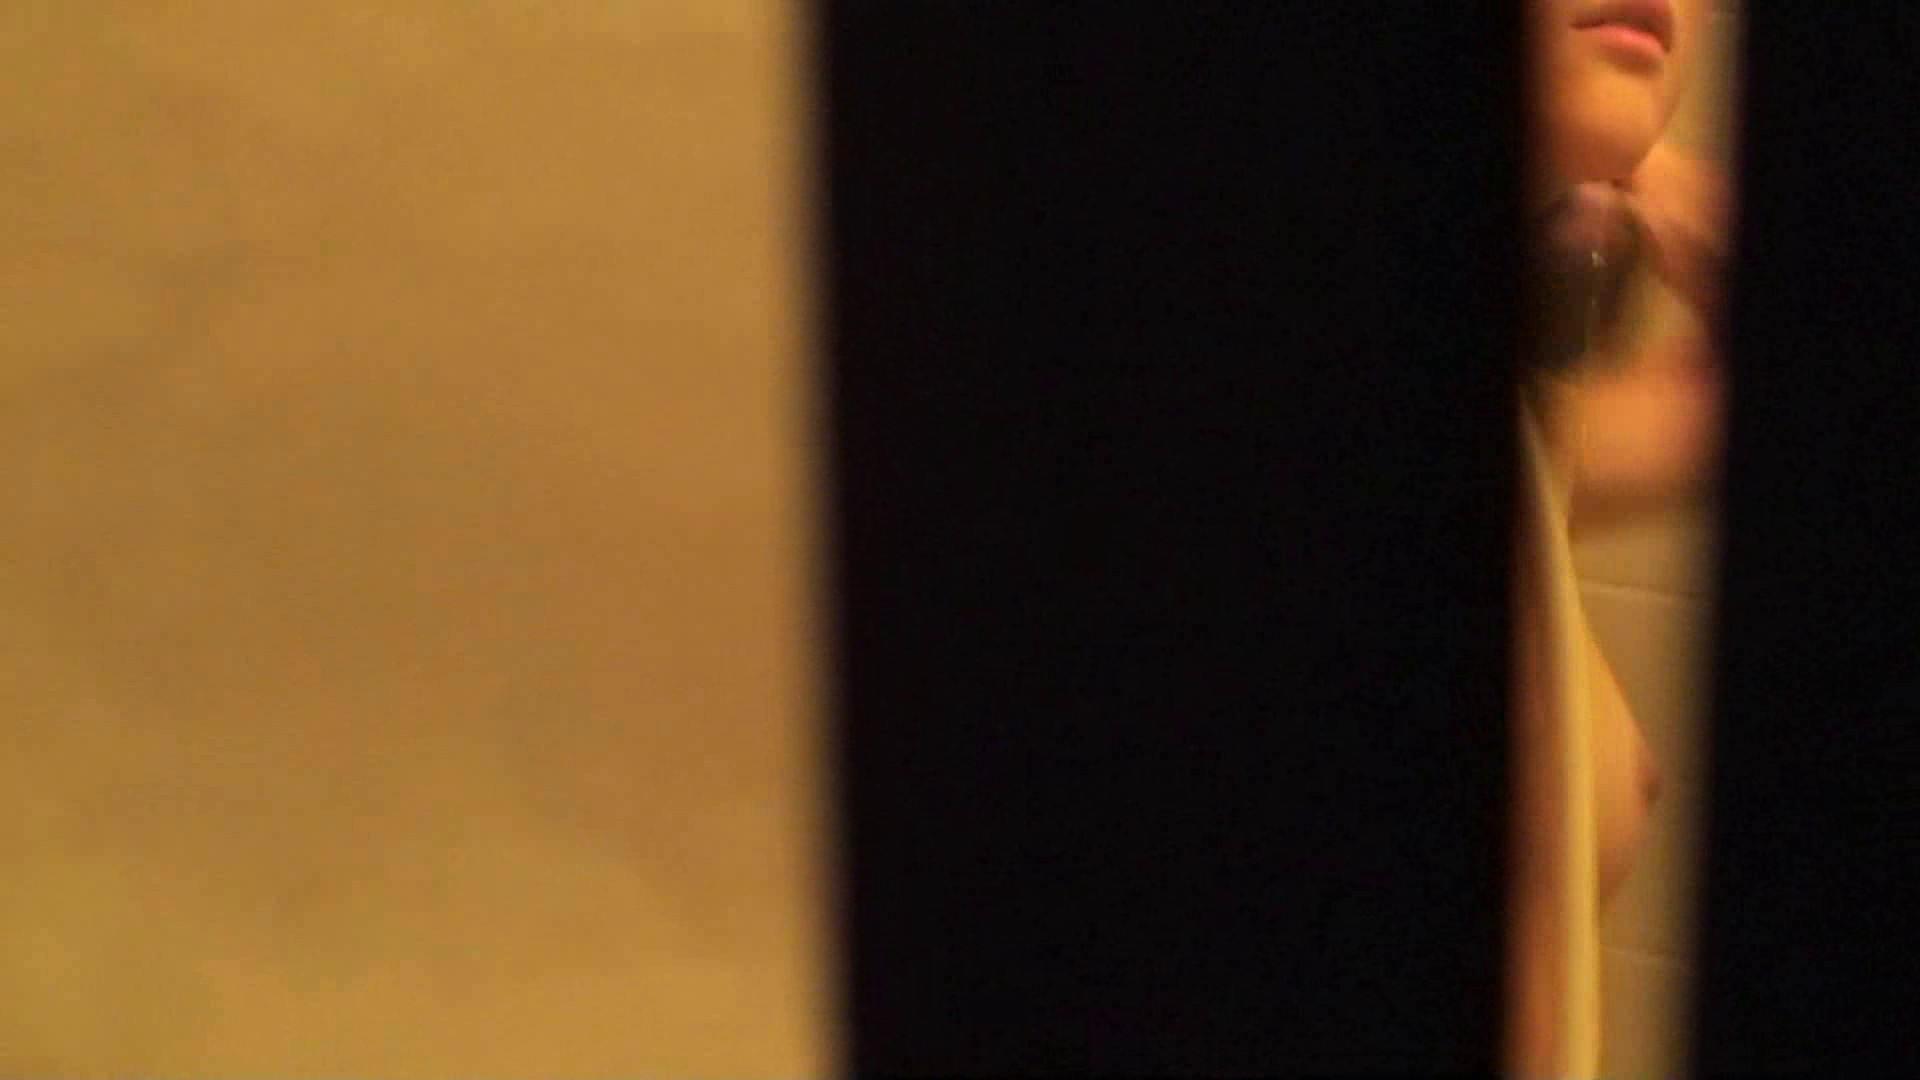 vol.02超可愛すぎる彼女の裸体をハイビジョンで!至近距離での眺め最高! 美人  78pic 48